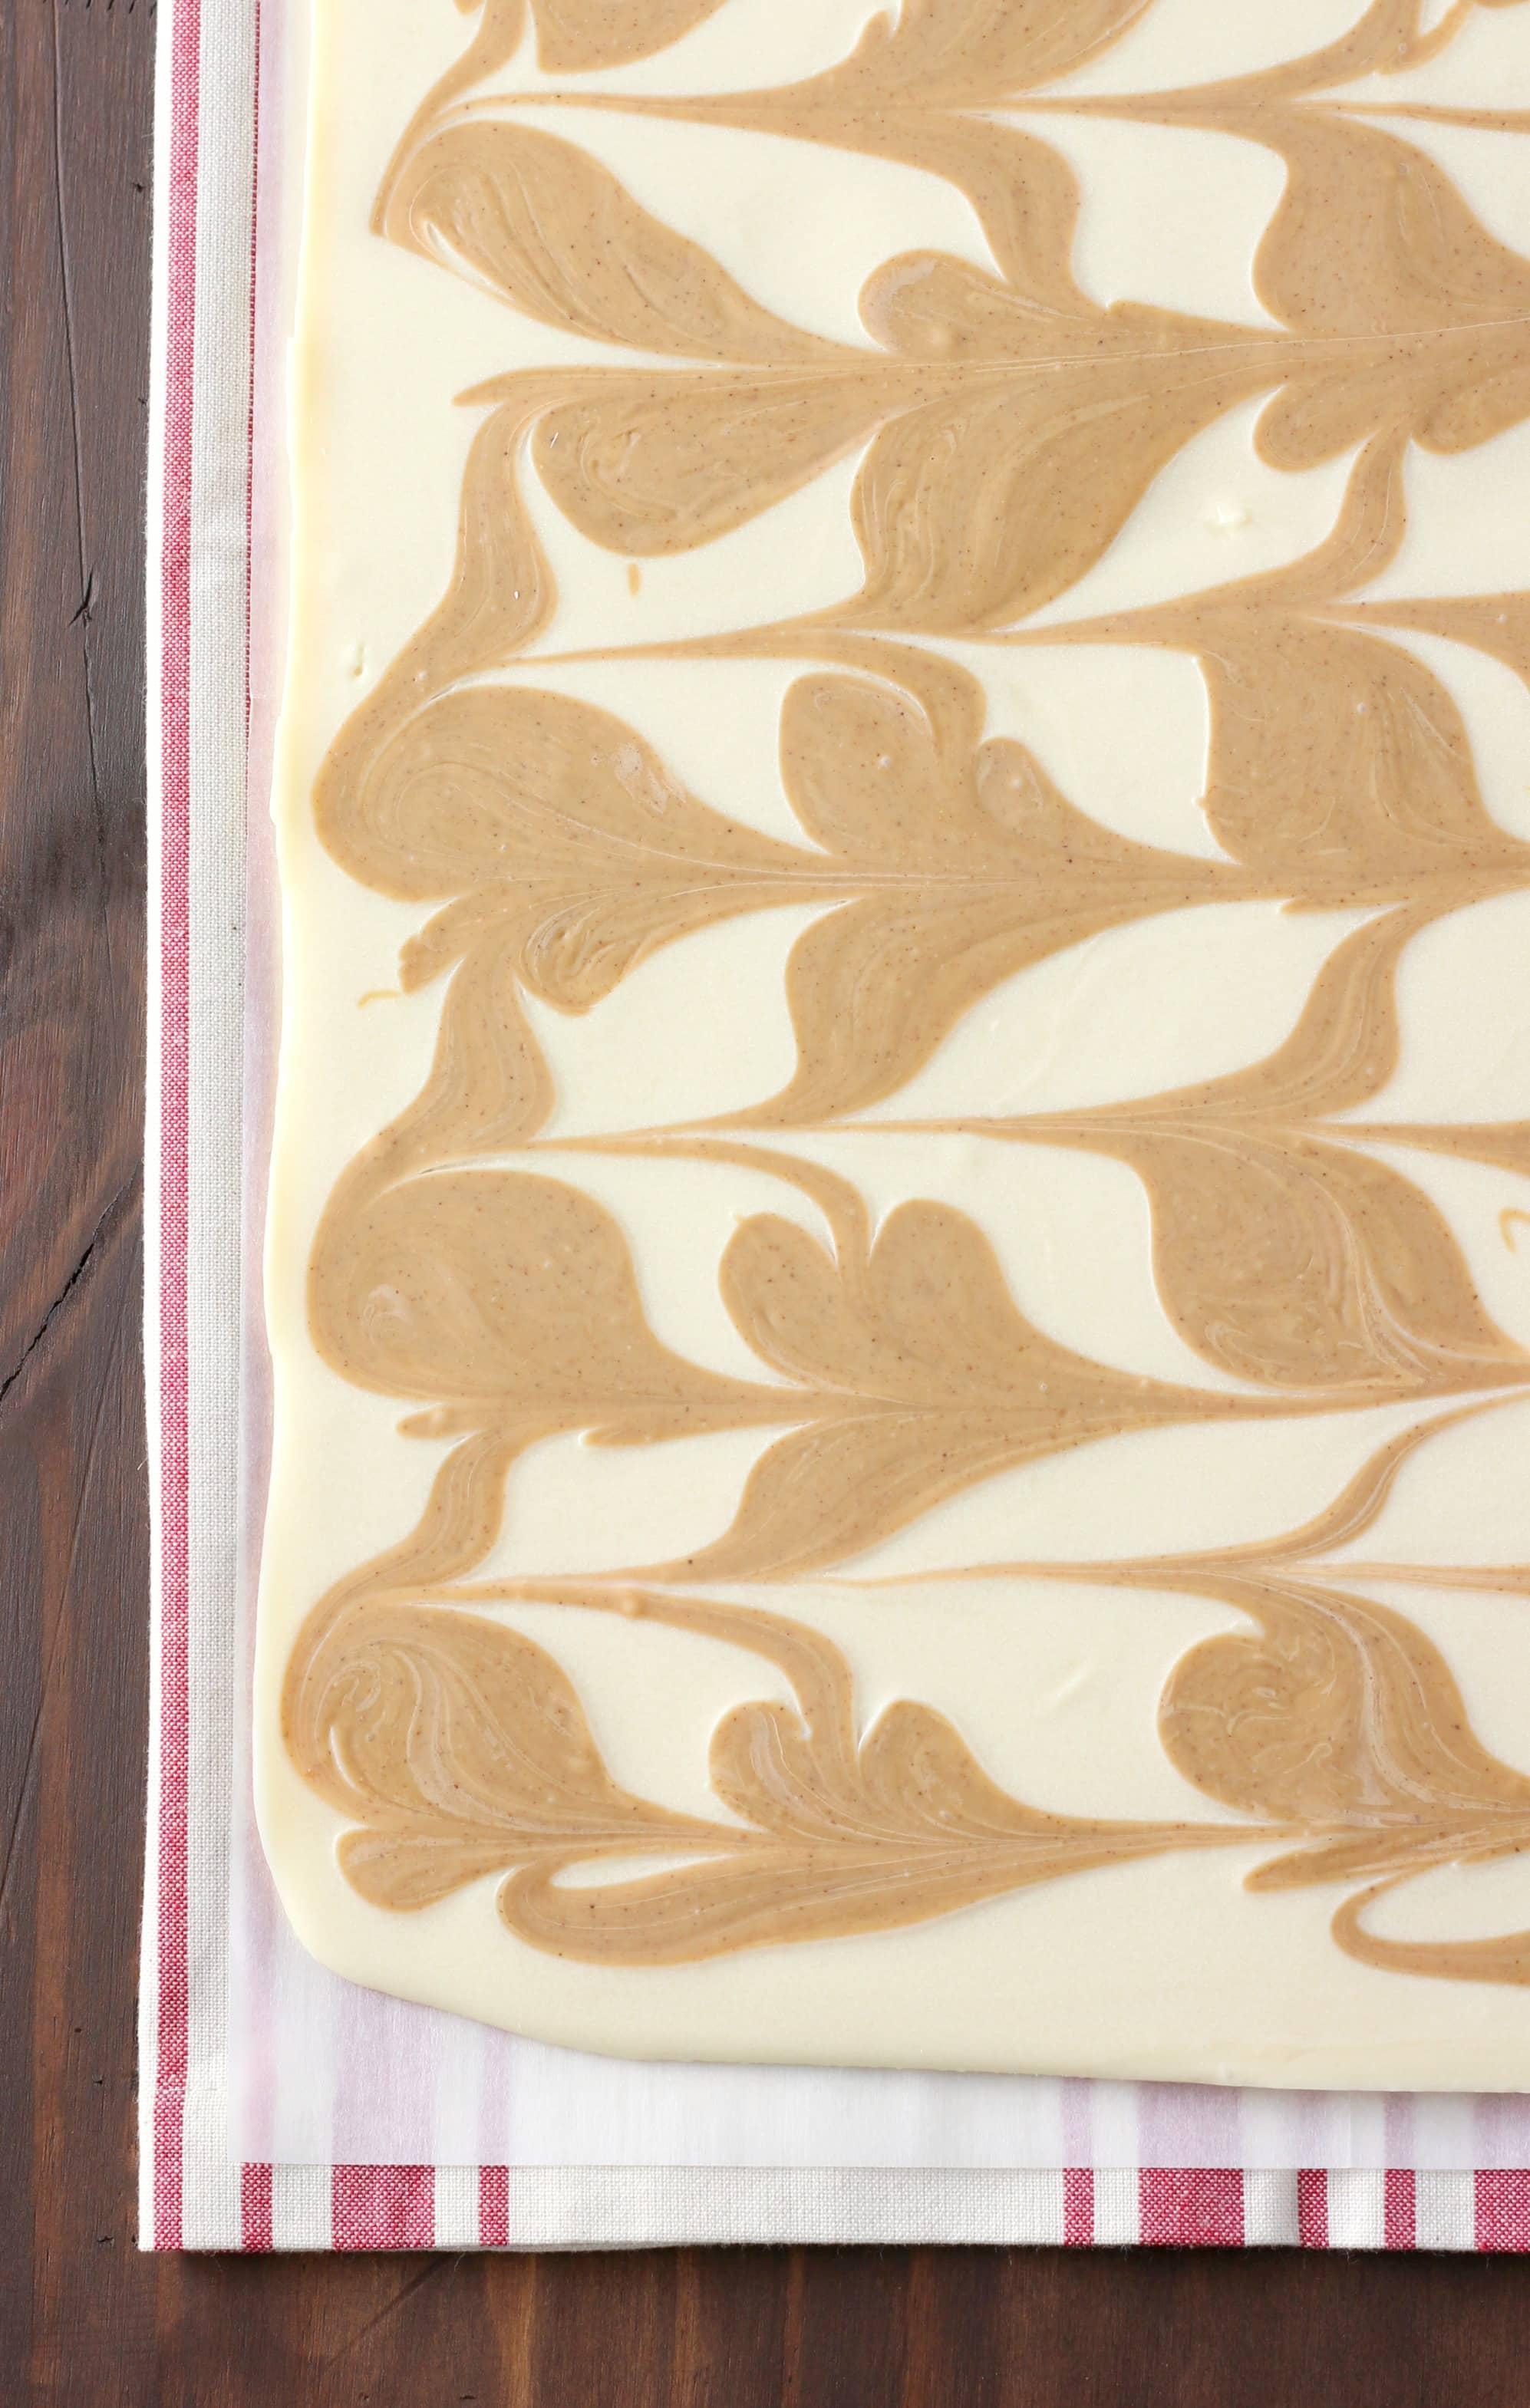 3 Ingredient Swirled Cookie Butter Bark Recipe form A Kitchen Addiction